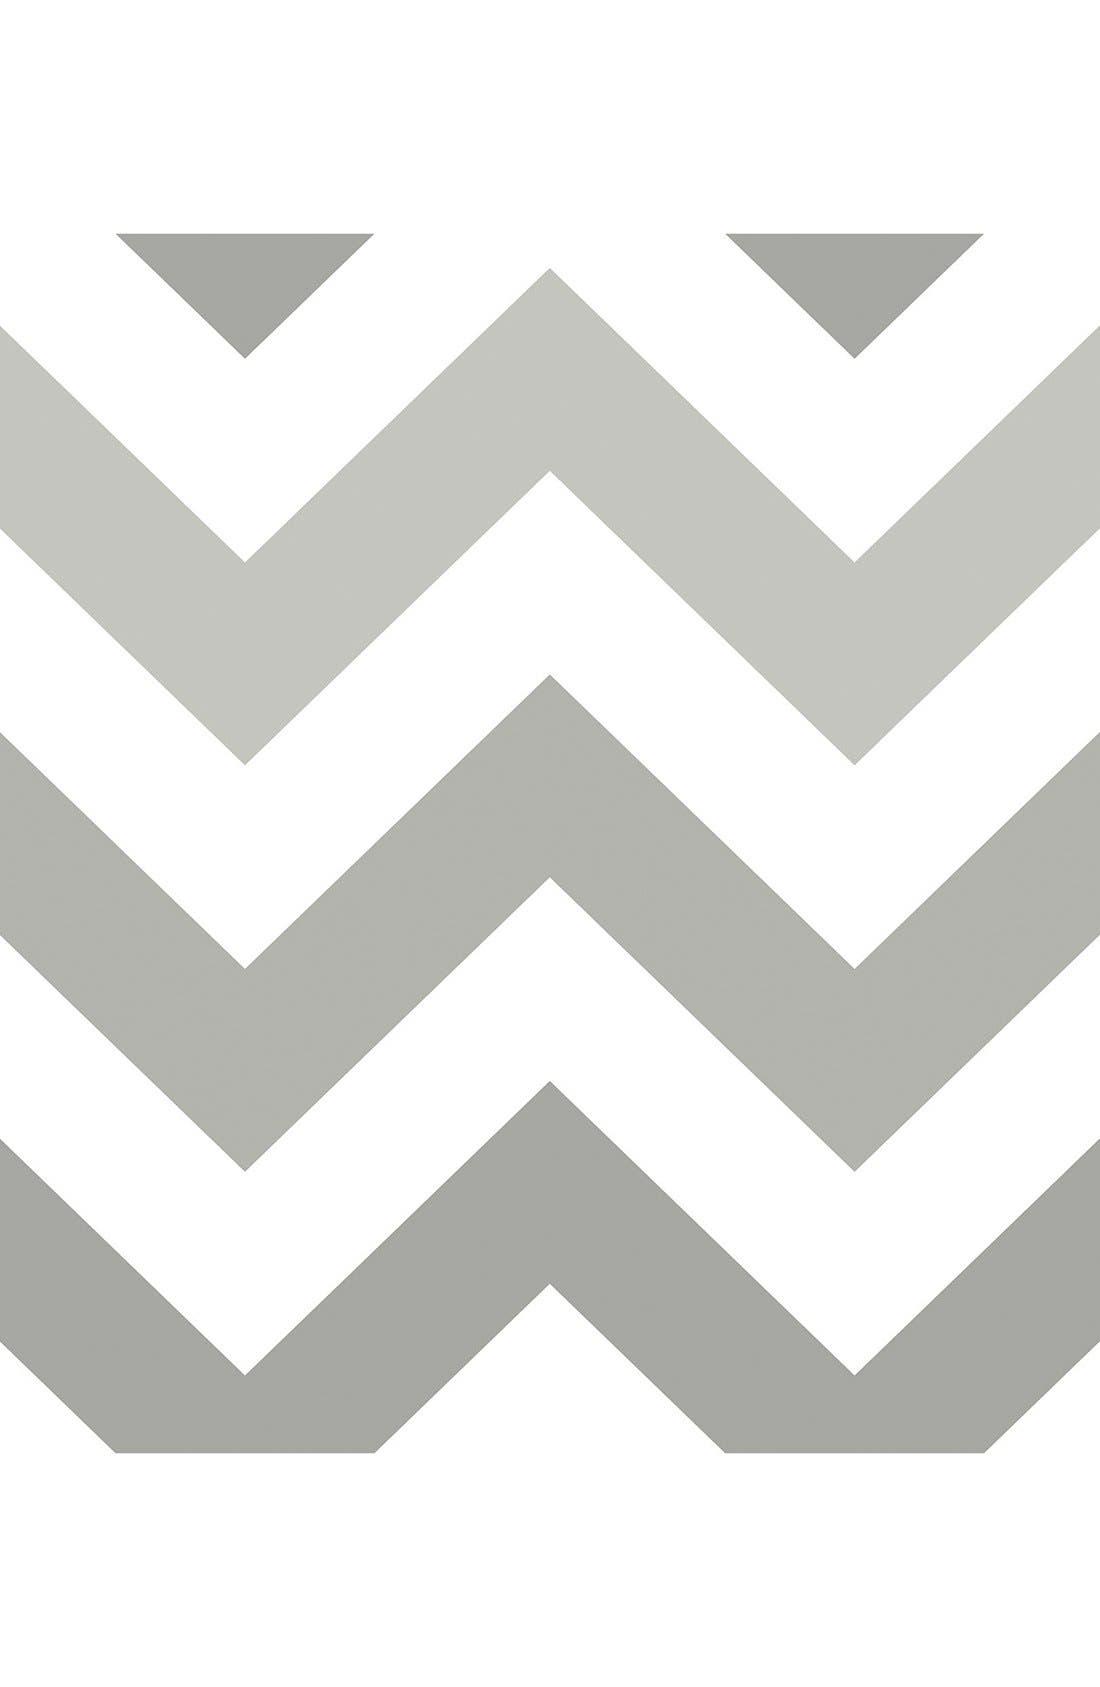 Main Image - Wallpops 'Zig Zag'  Peel & Stick Vinyl Wallpaper